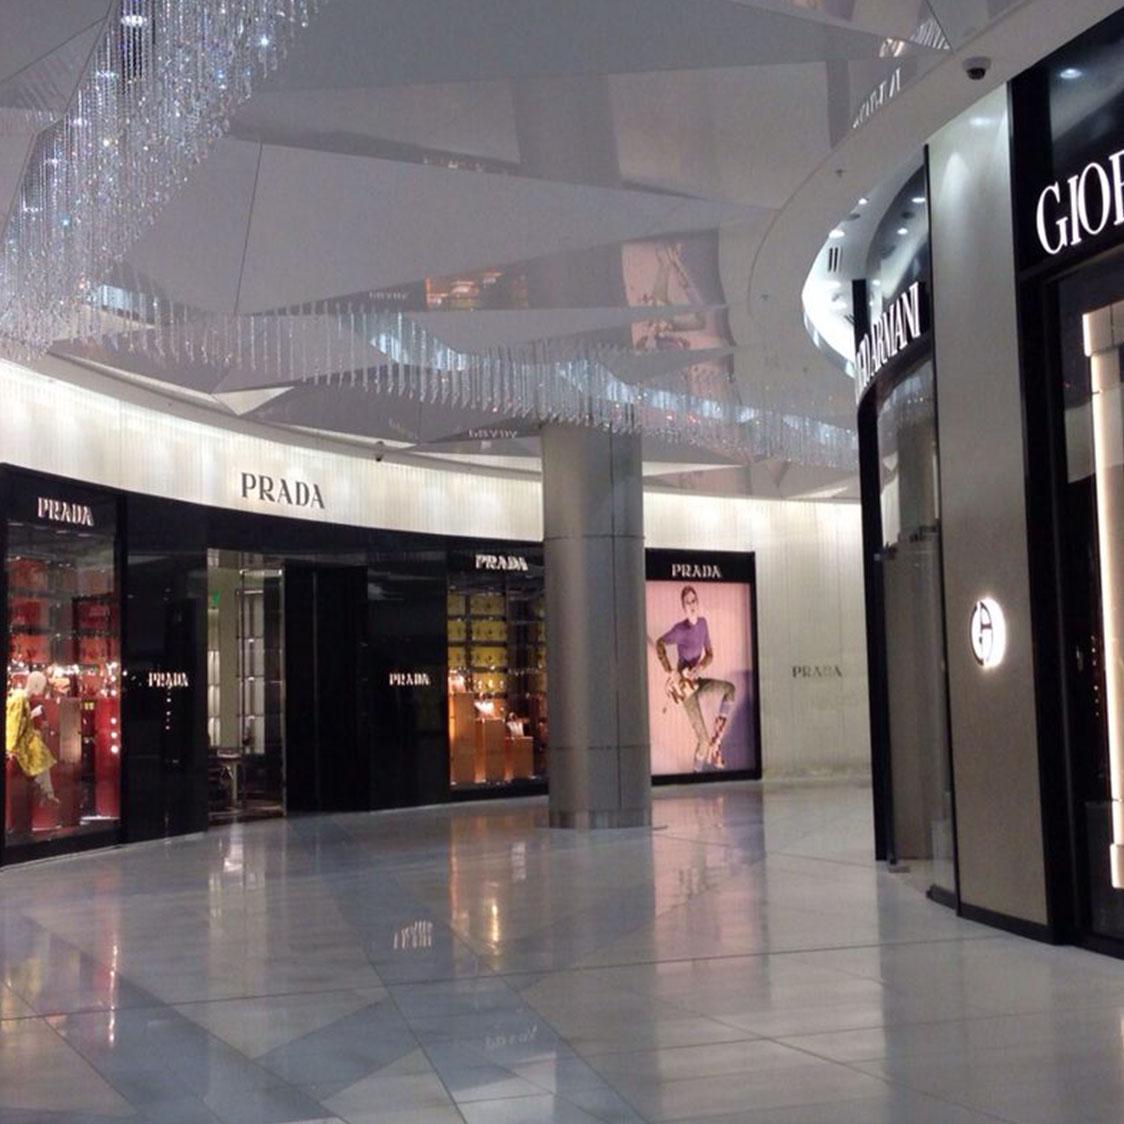 Prada-and-Giorgio-Armani-store-at-Sandton-Johannesburg-South-Africa 1124